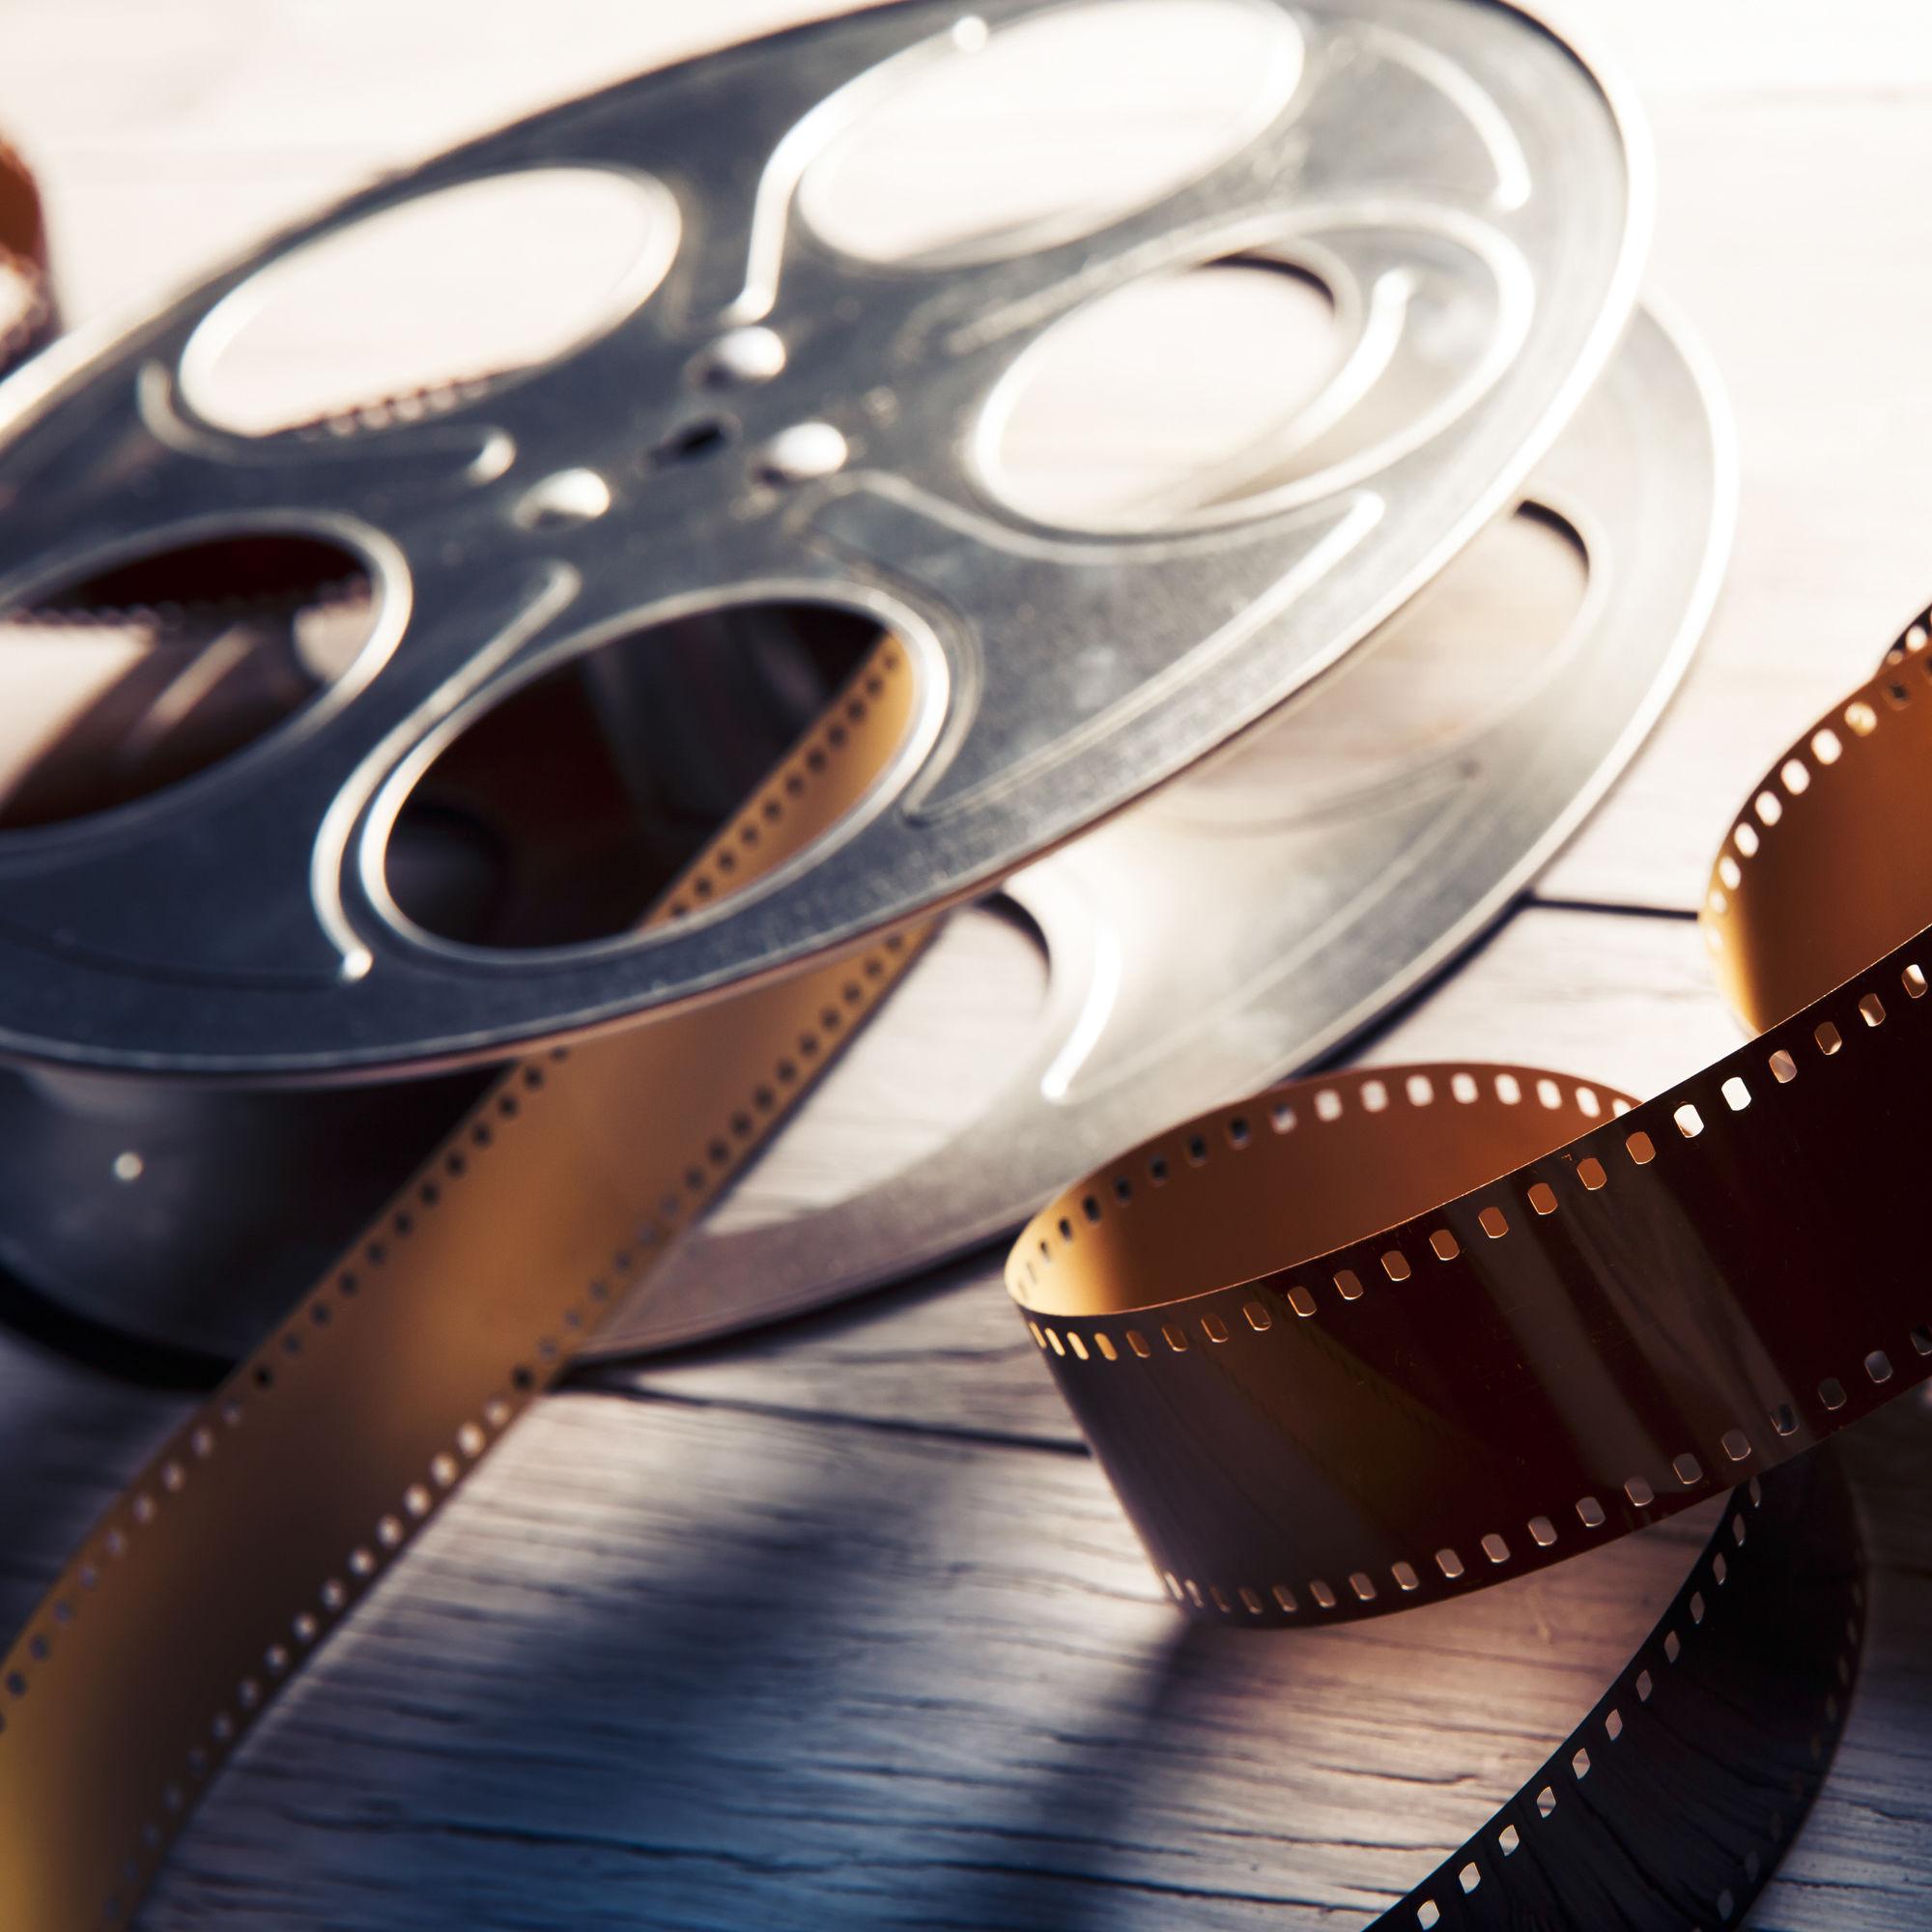 Sarasota film festival xzrmgu